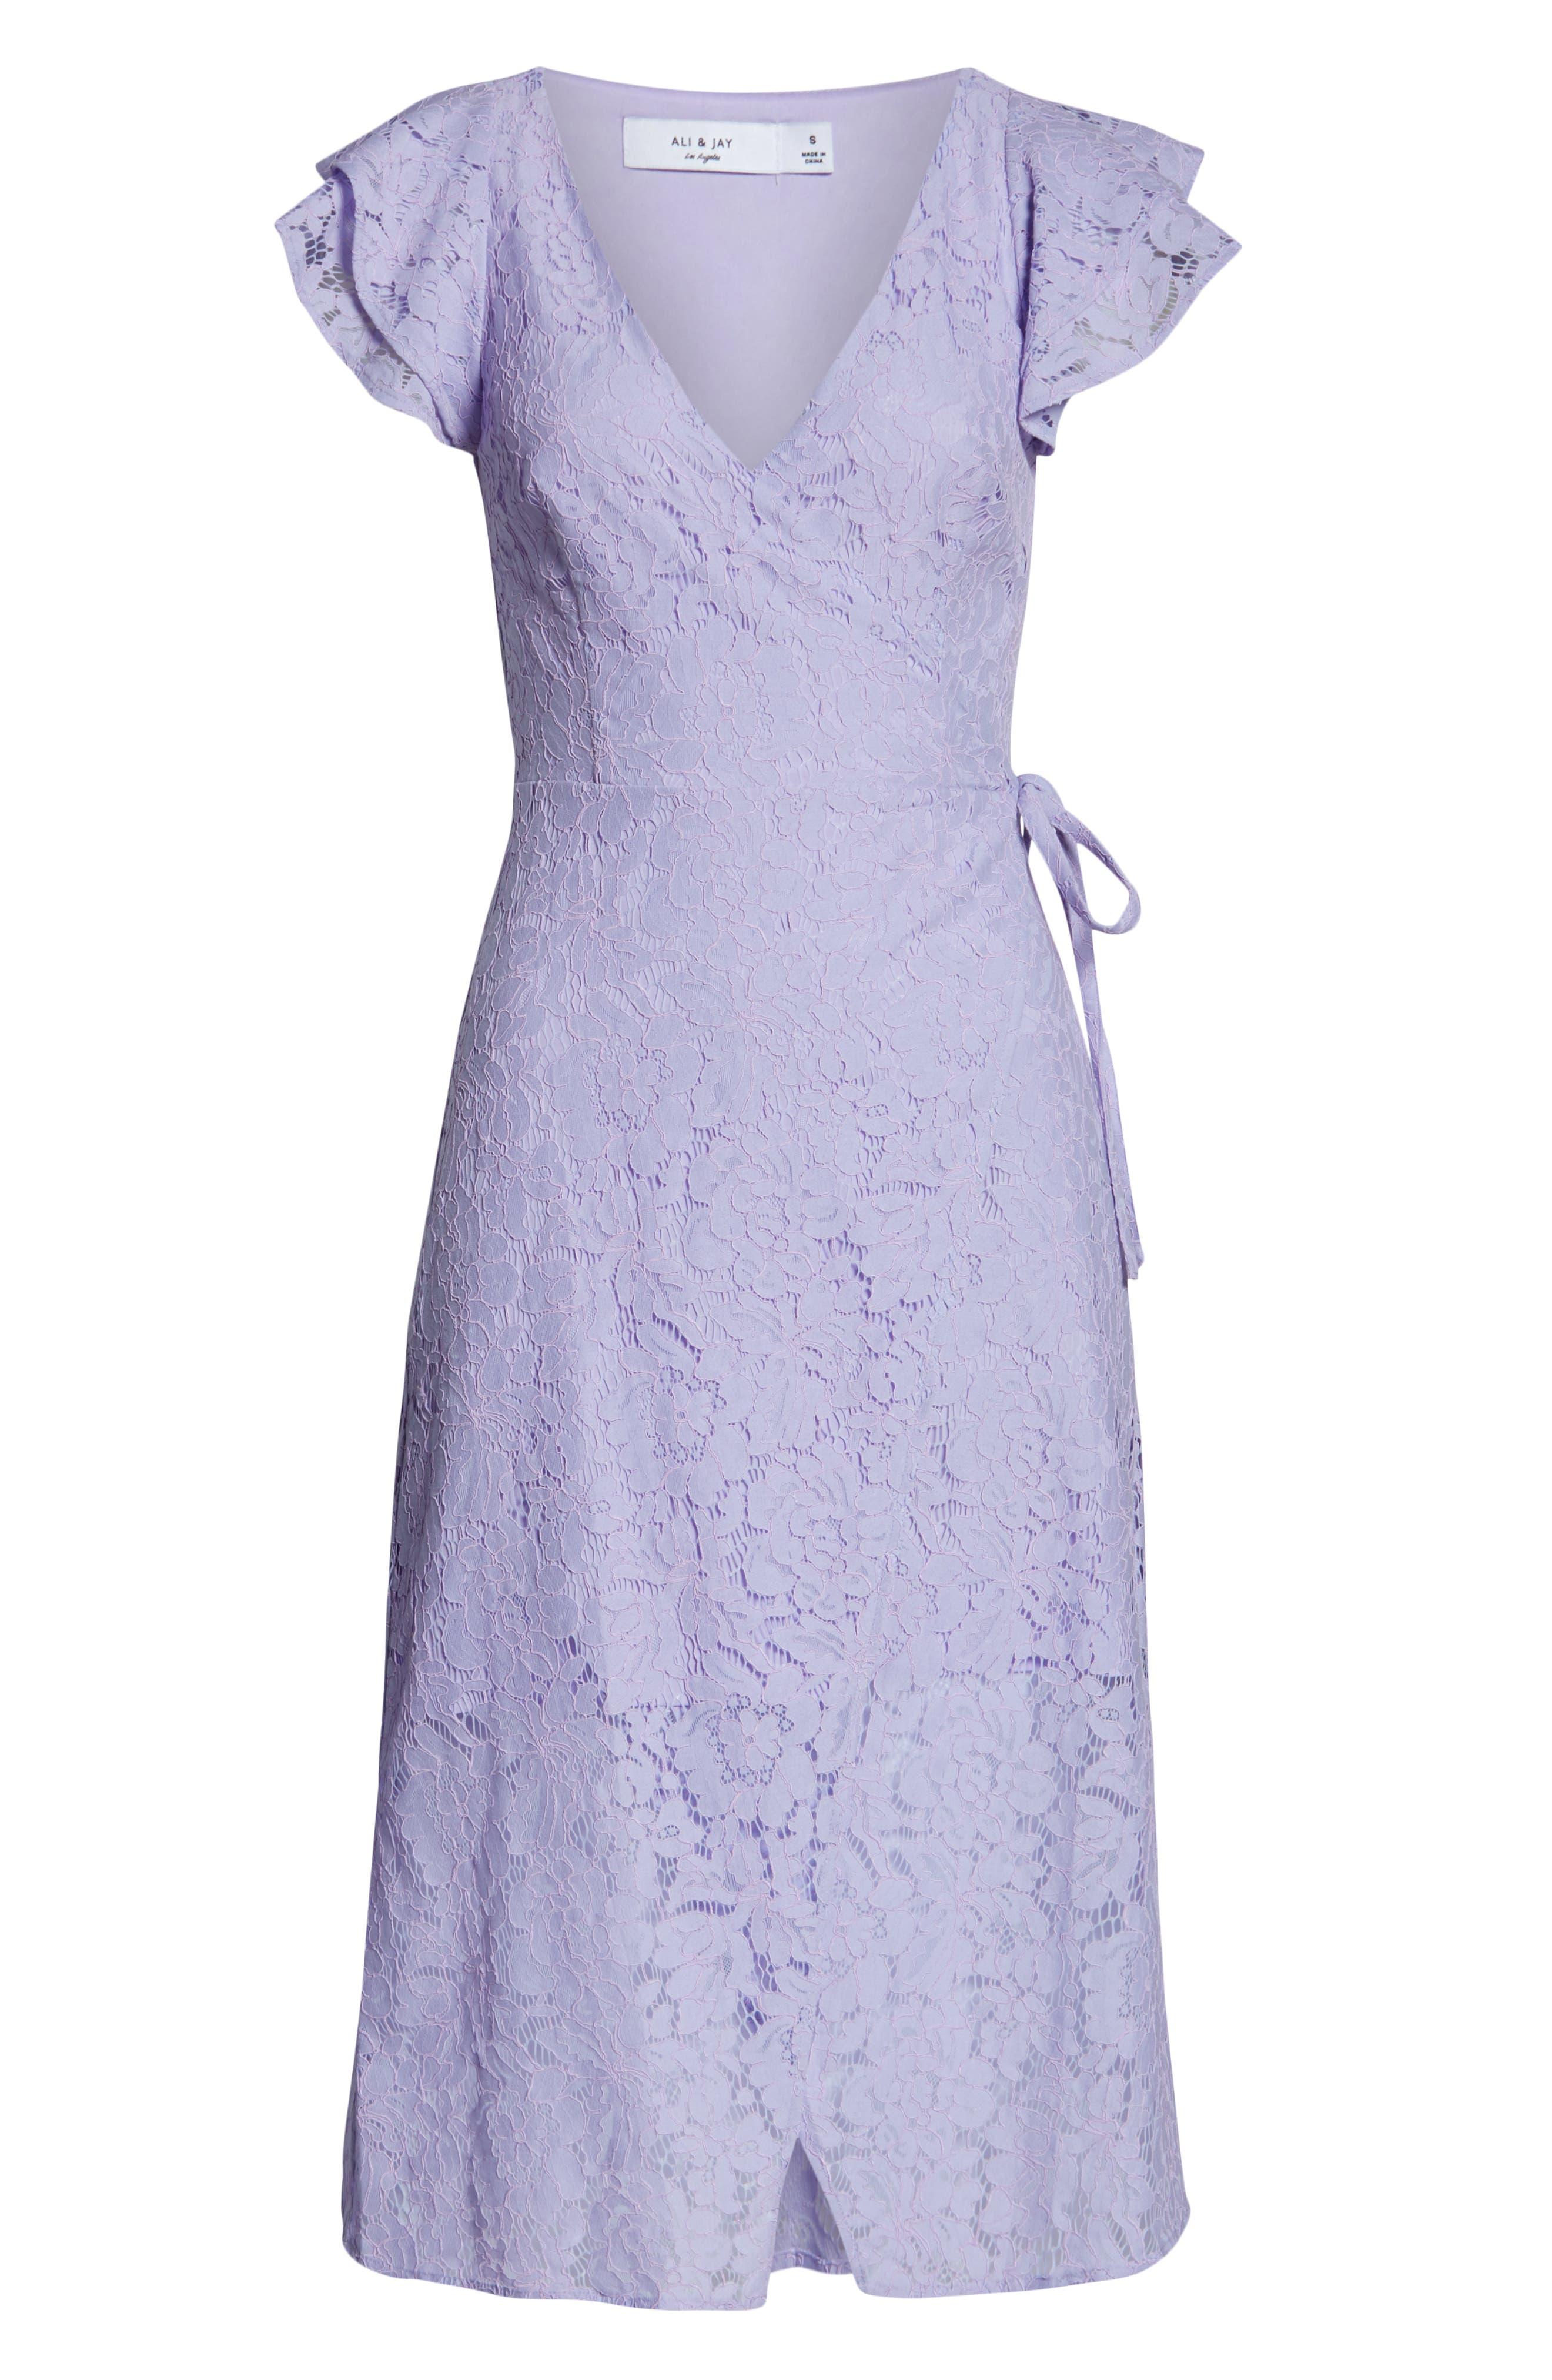 ALI & JAY, Ruffle Sleeve Wrap Lace Midi Dress, Alternate thumbnail 7, color, LAVENDER